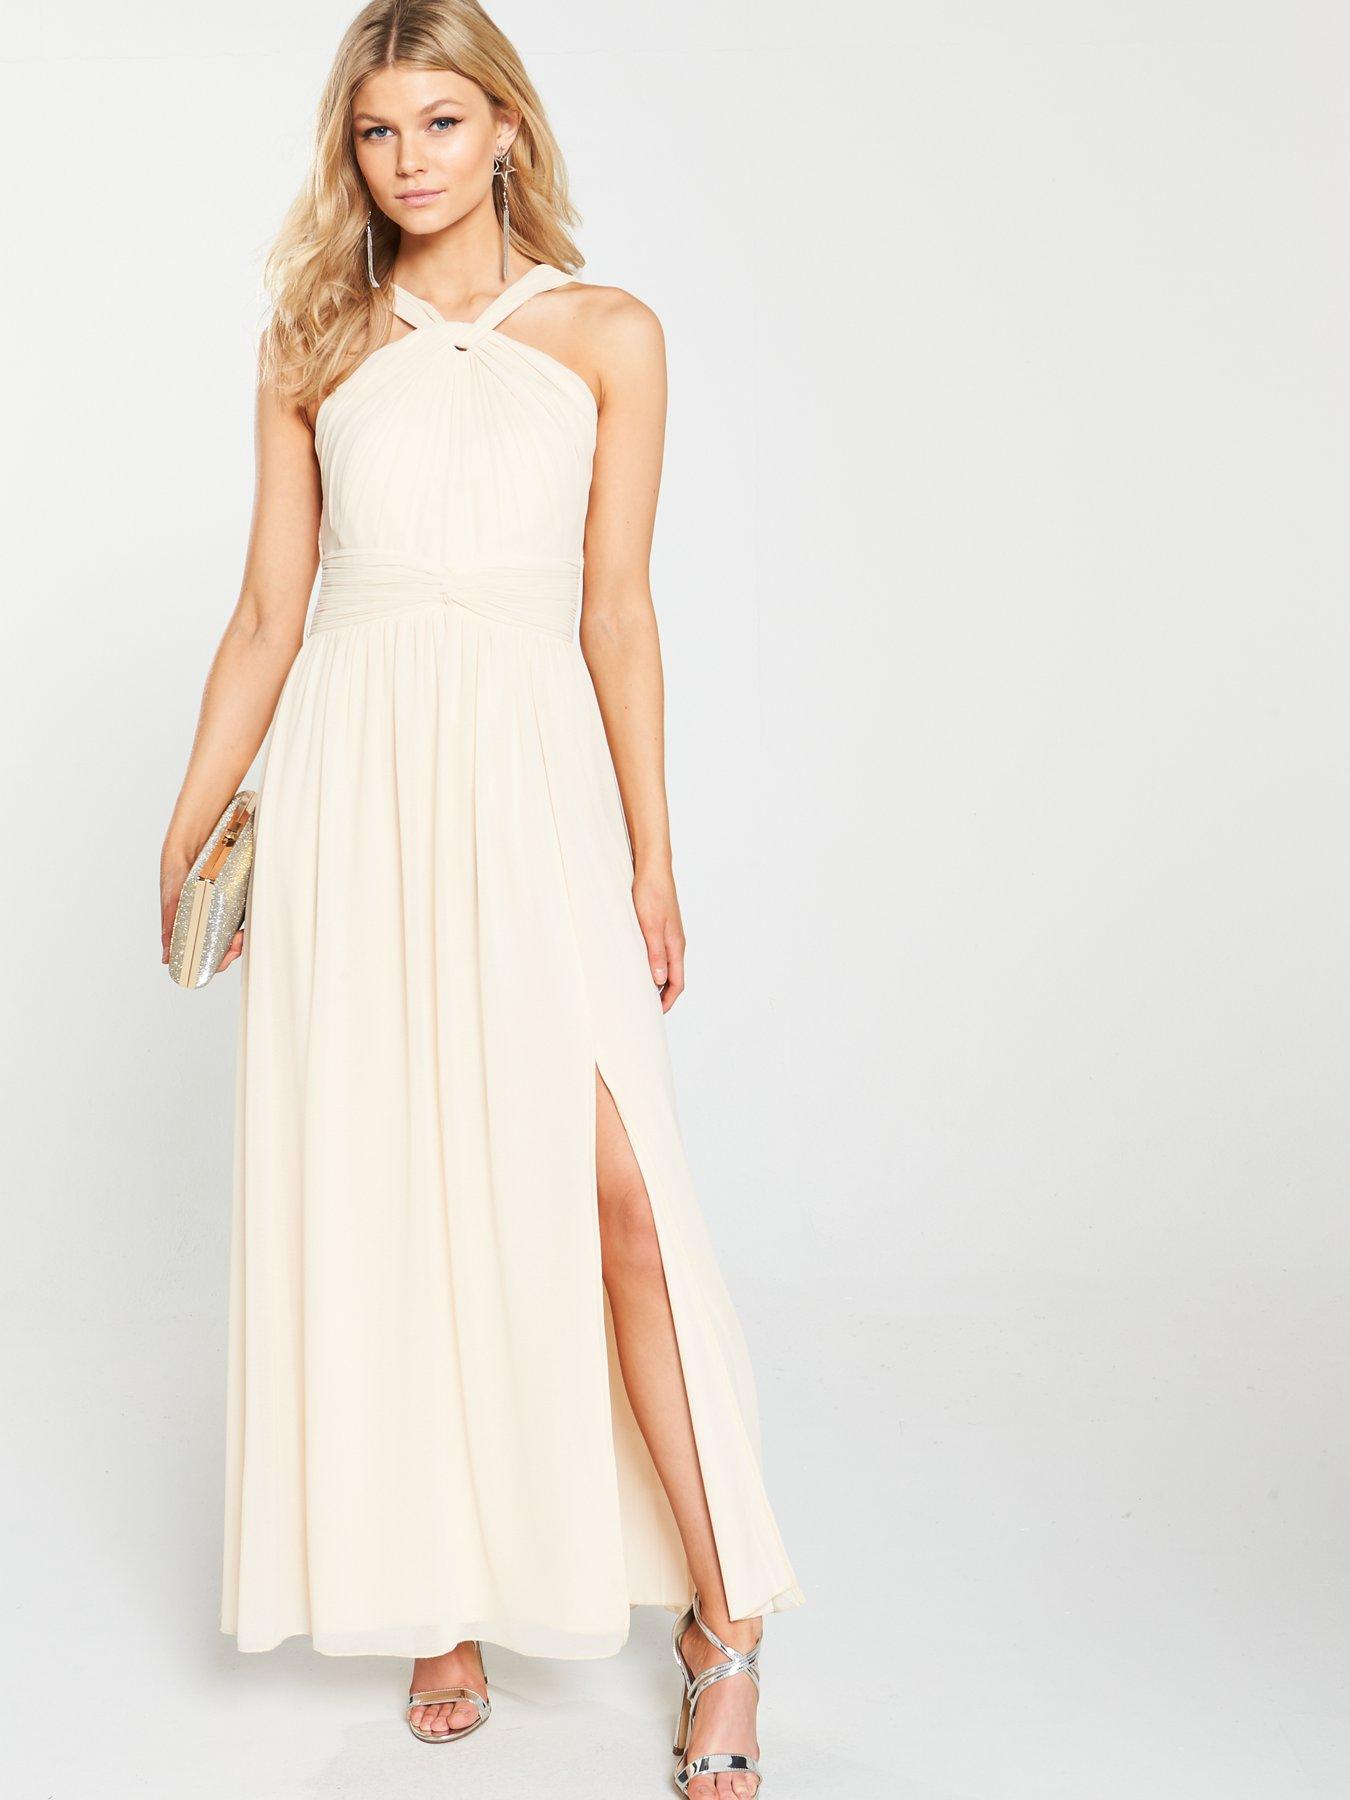 Long White Maxi Dresses Women